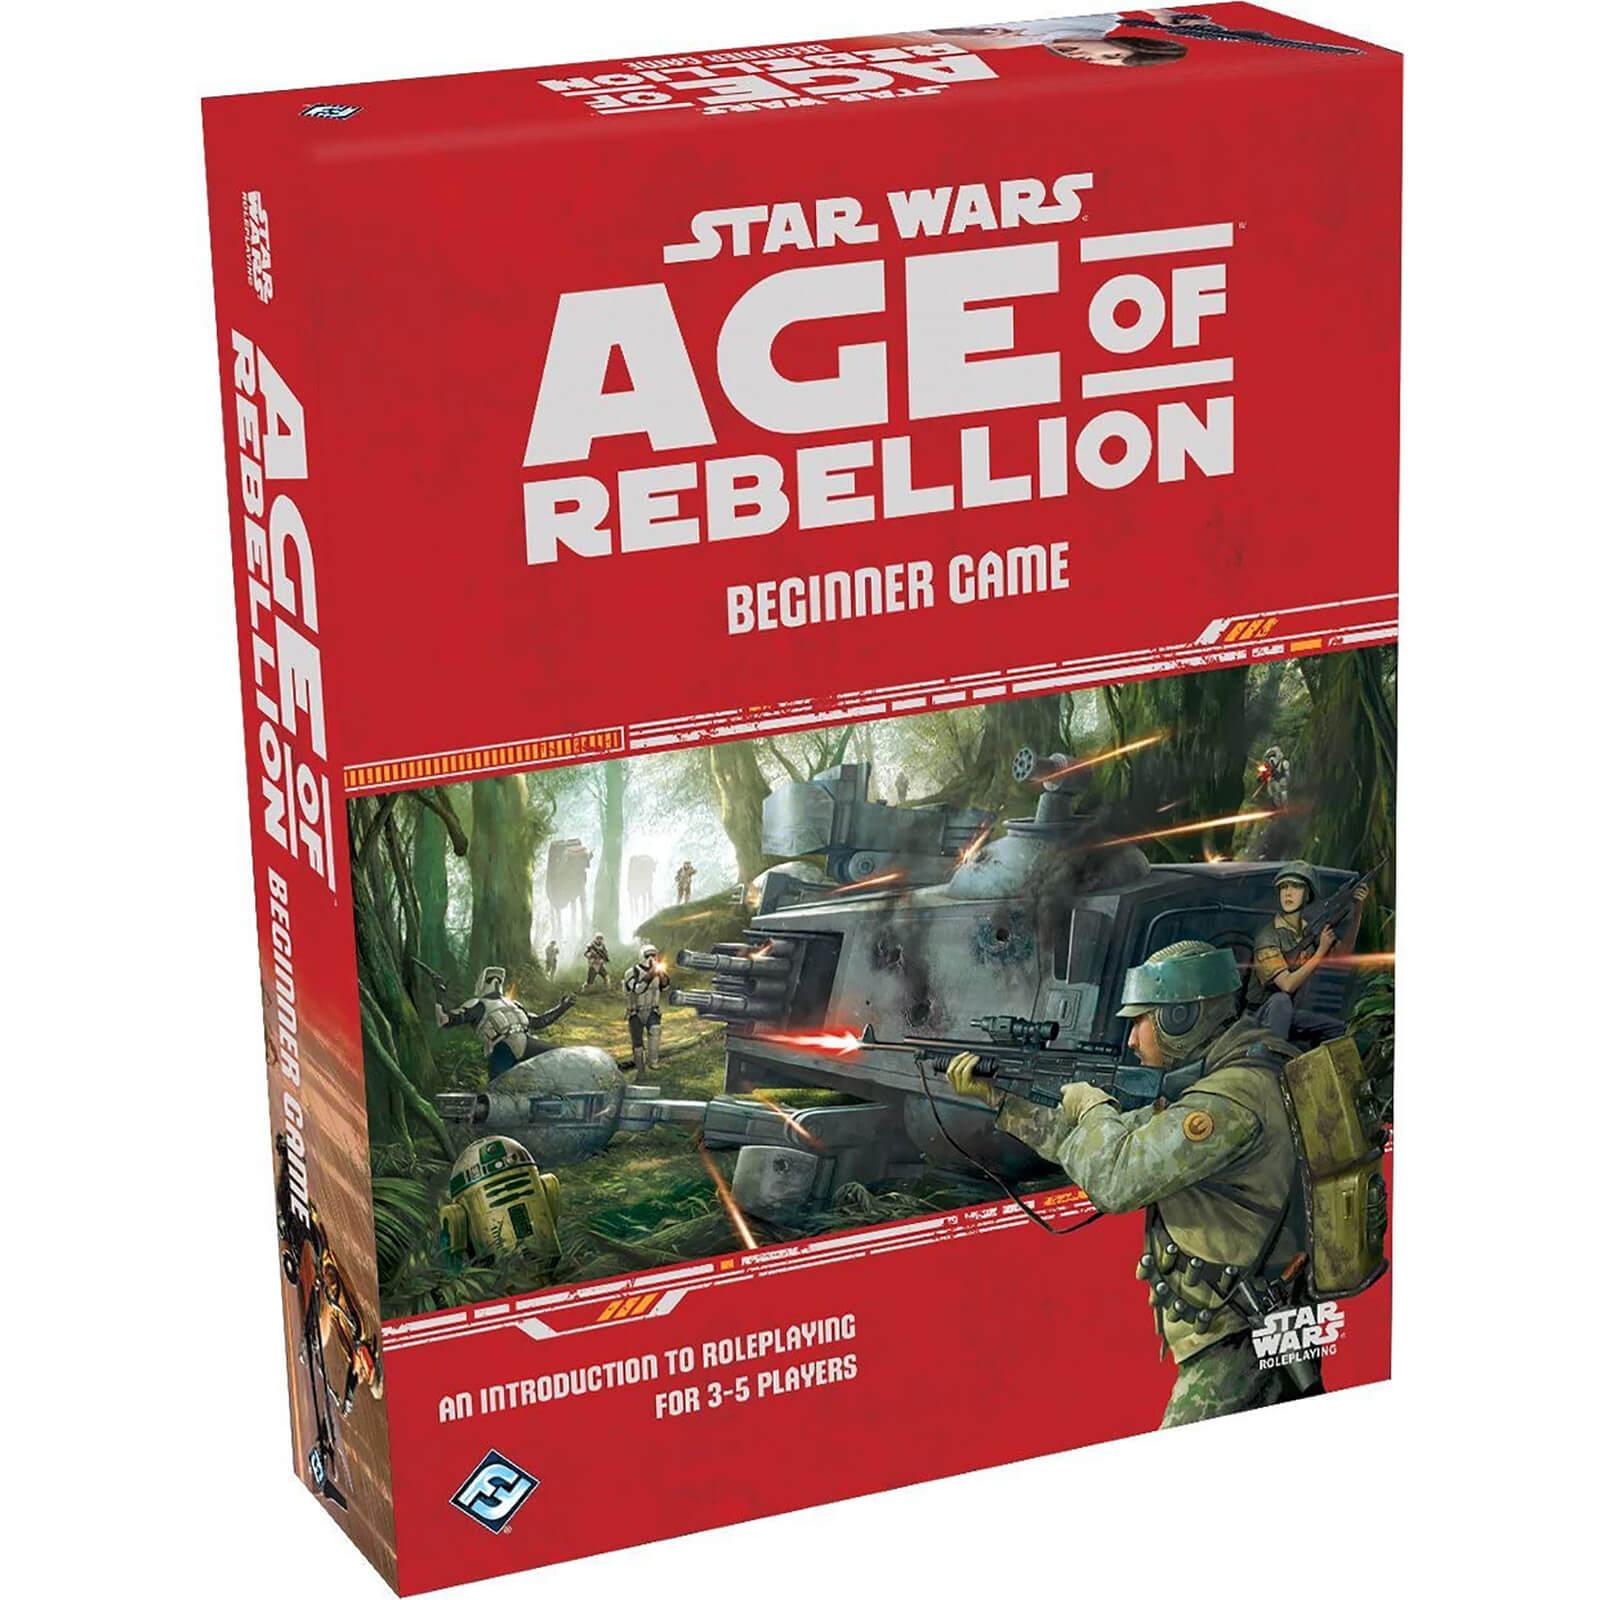 Image of Star Wars: Age of Rebellion Beginner Board Game